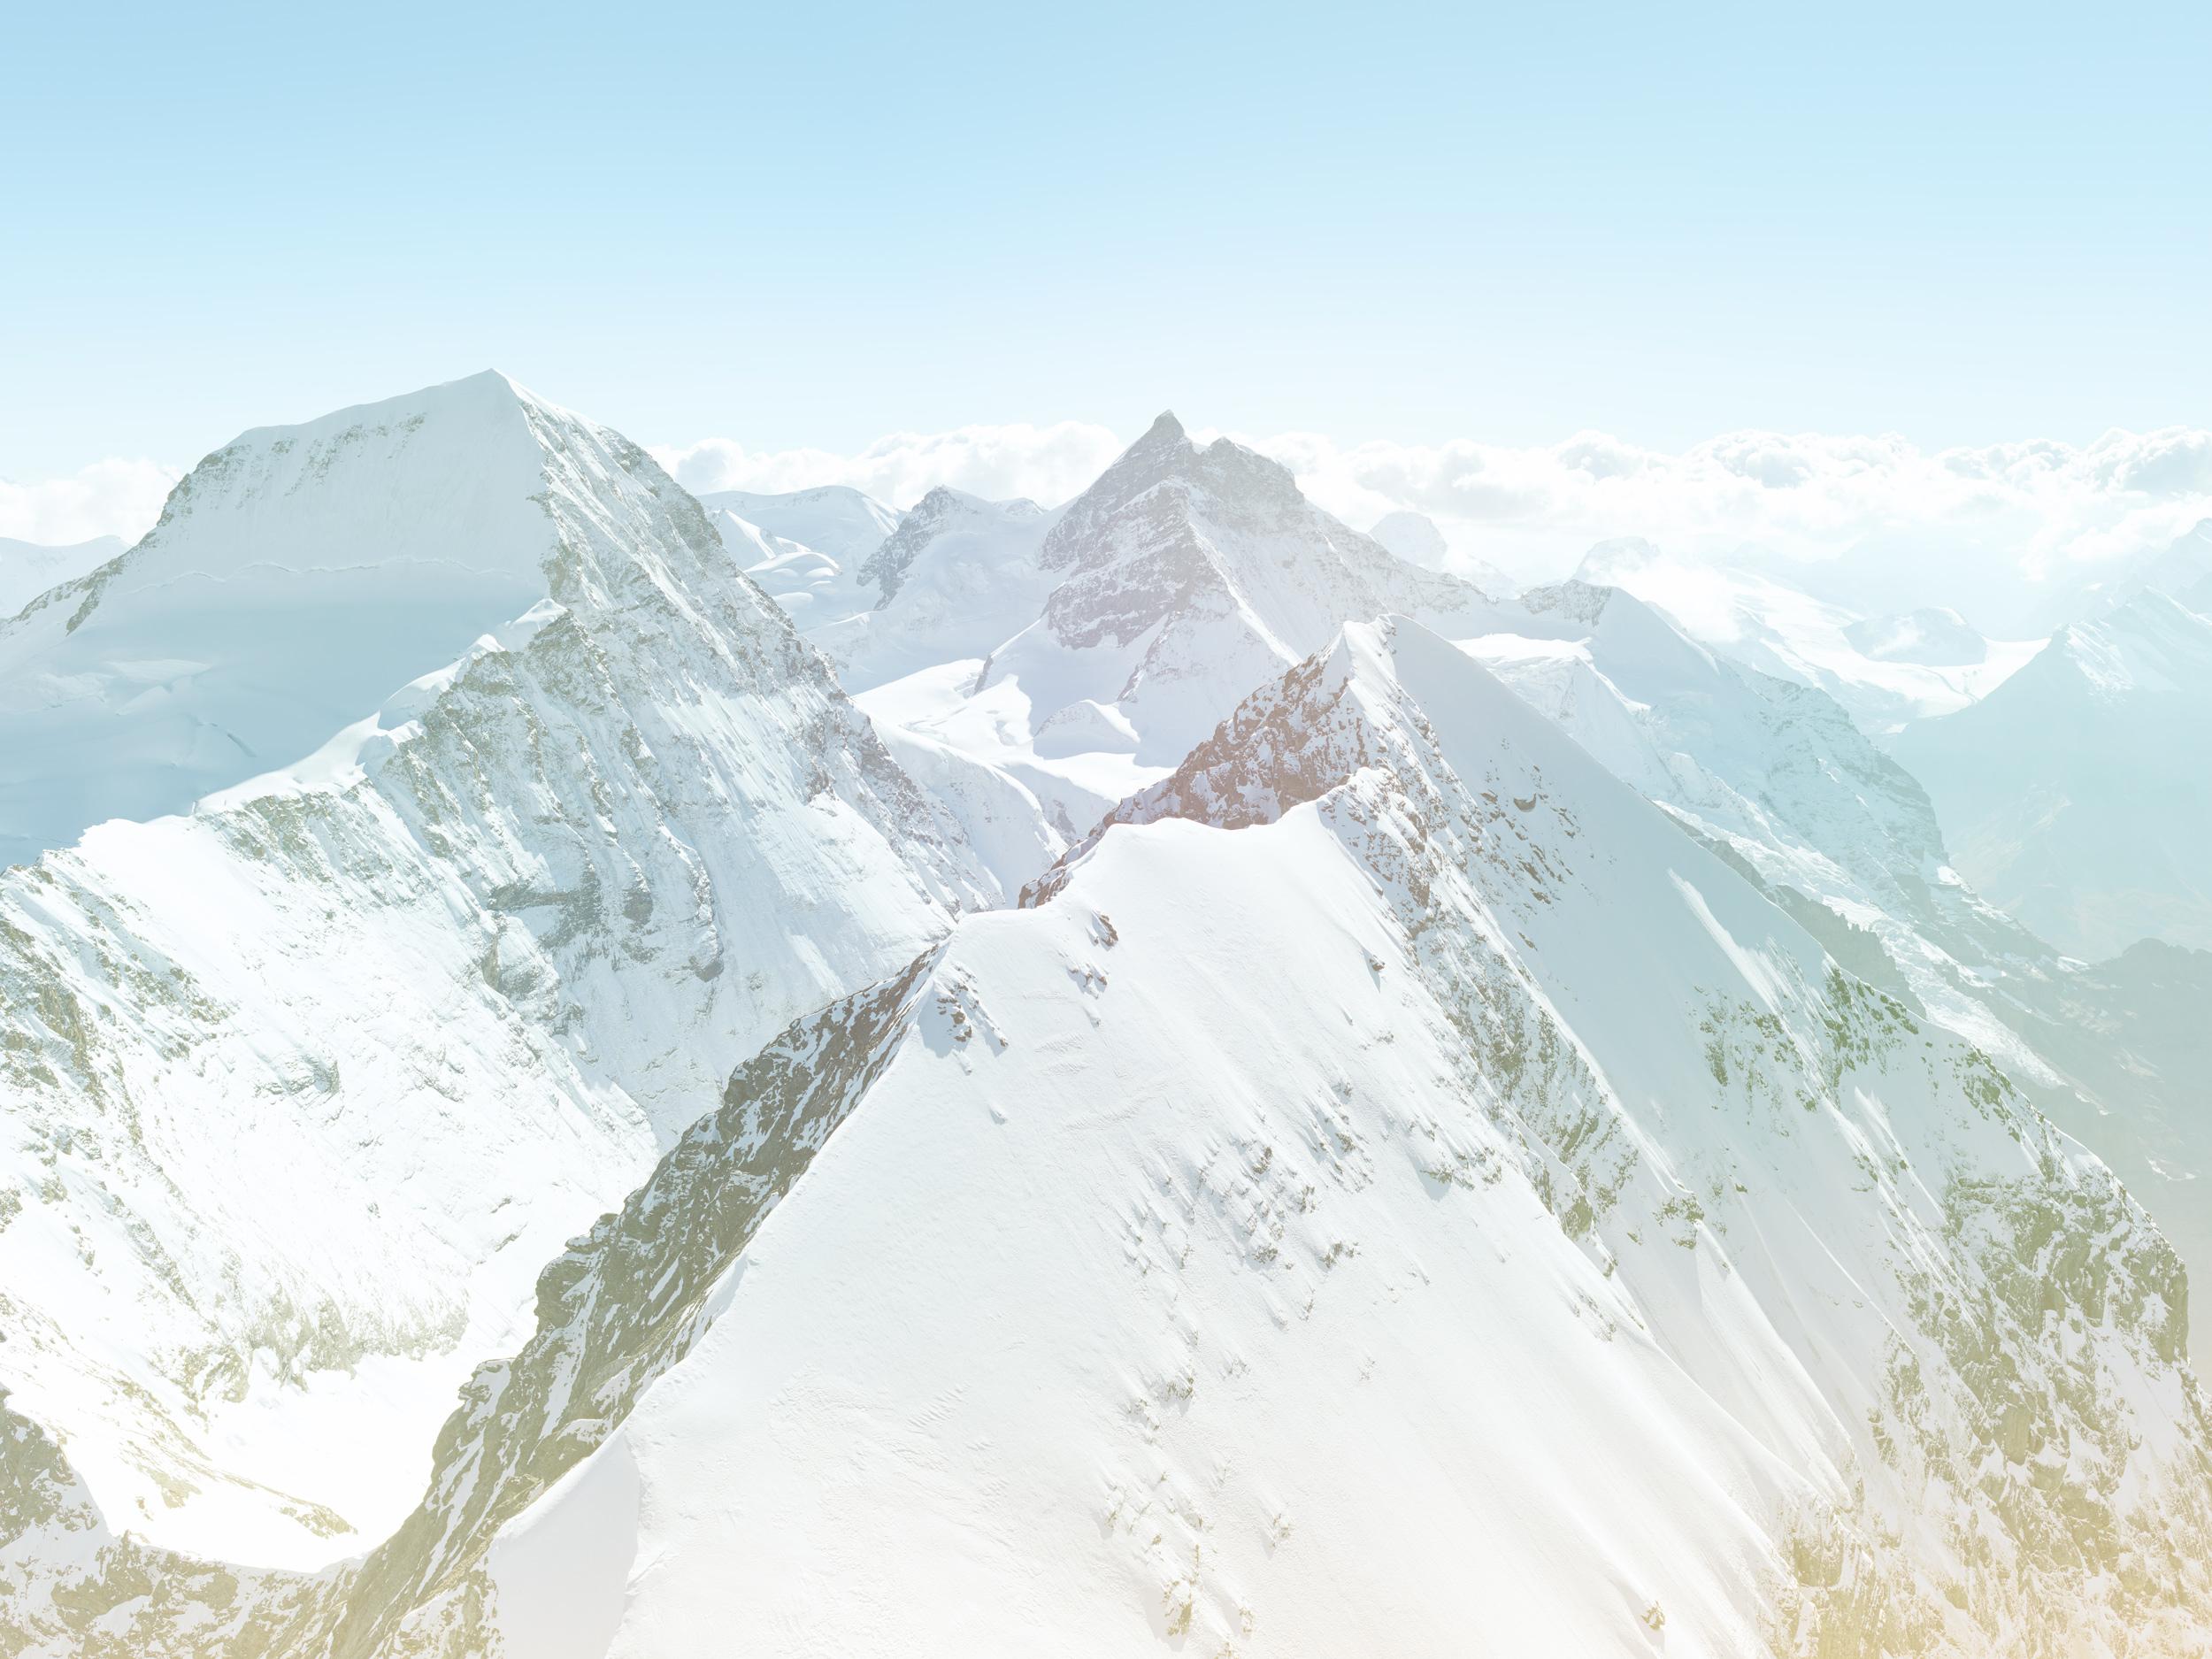 Eiger-Monch-Jungfrau.jpg